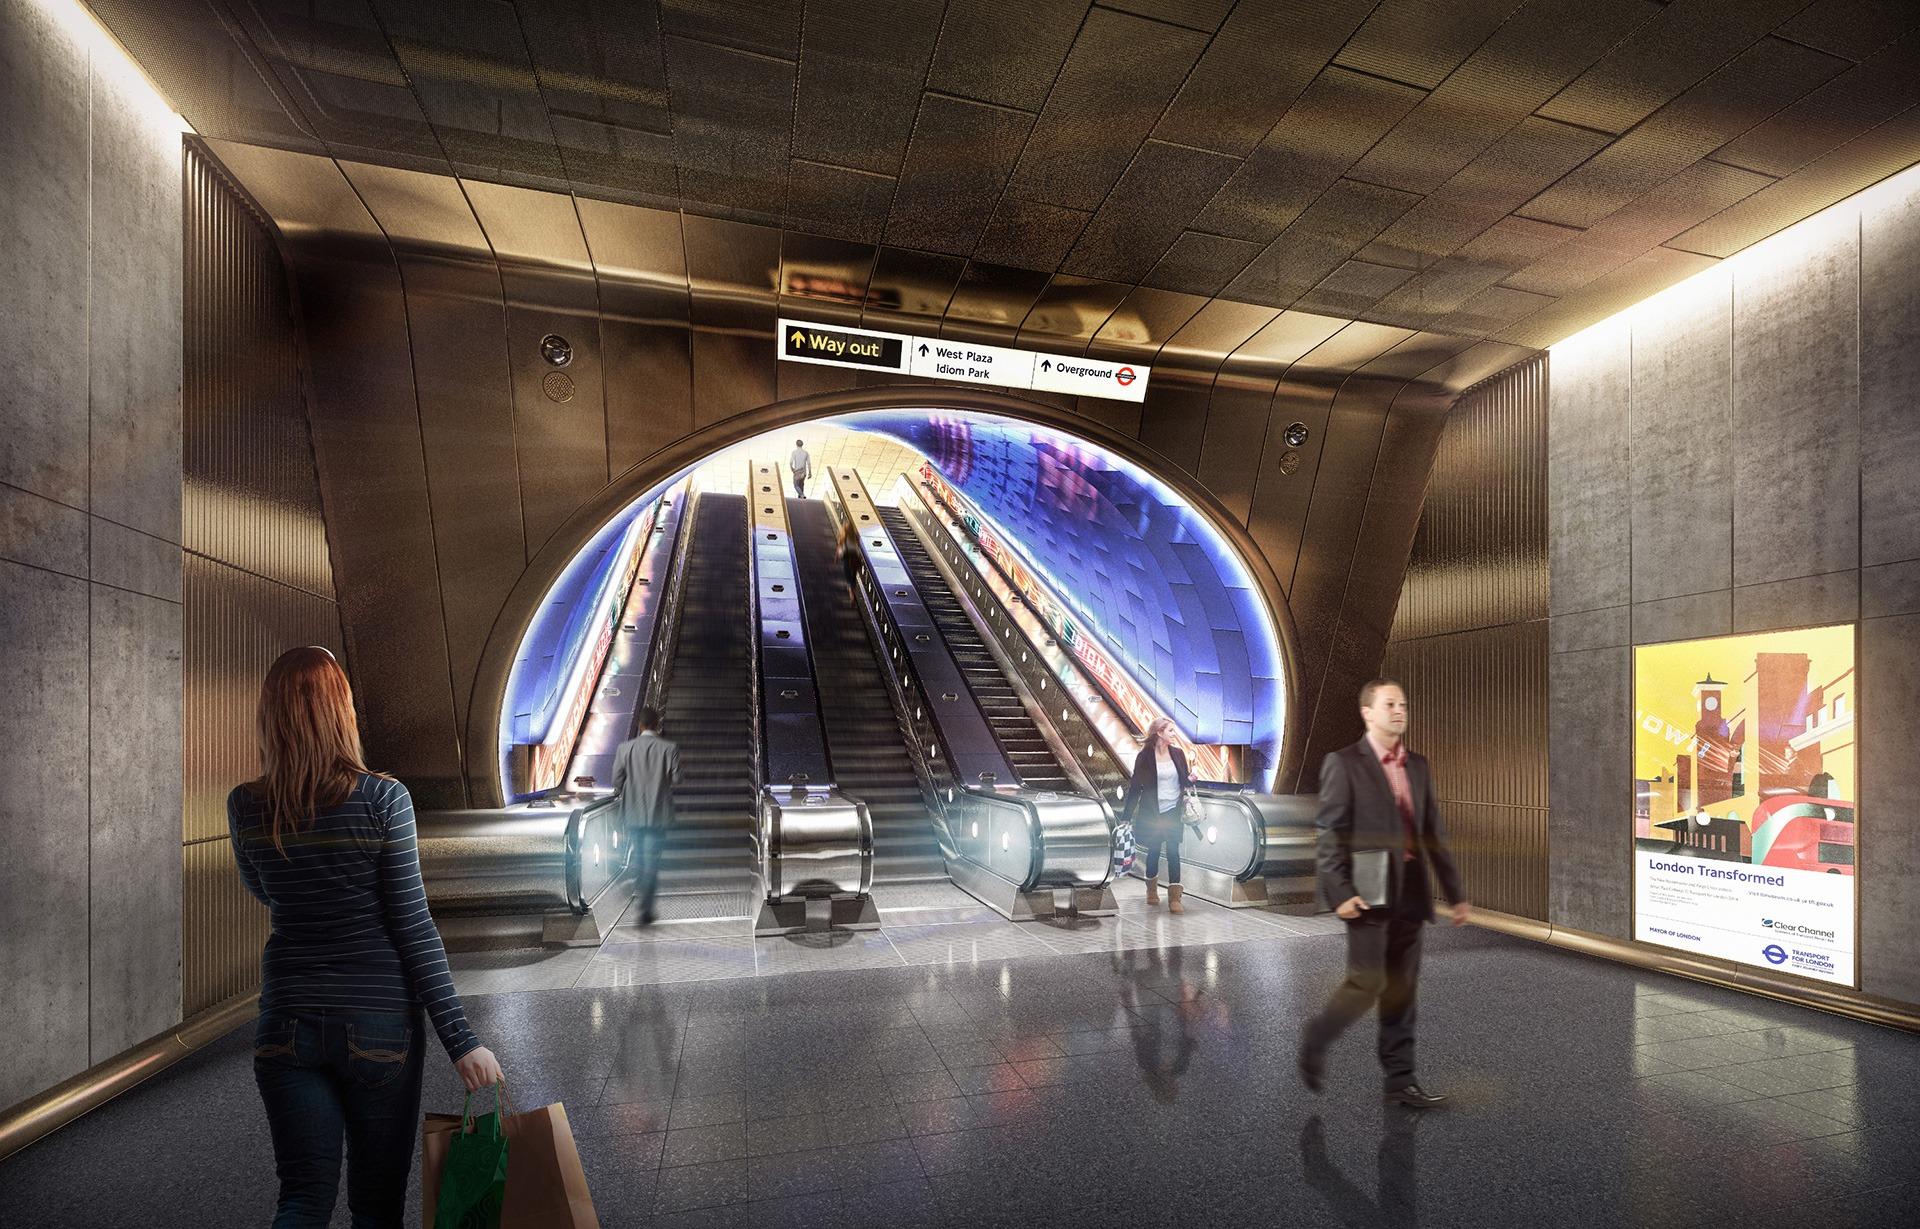 stas3dart-london-underground-ava-architecture-studio-egret-west-promotional-image-modelling-gallery1